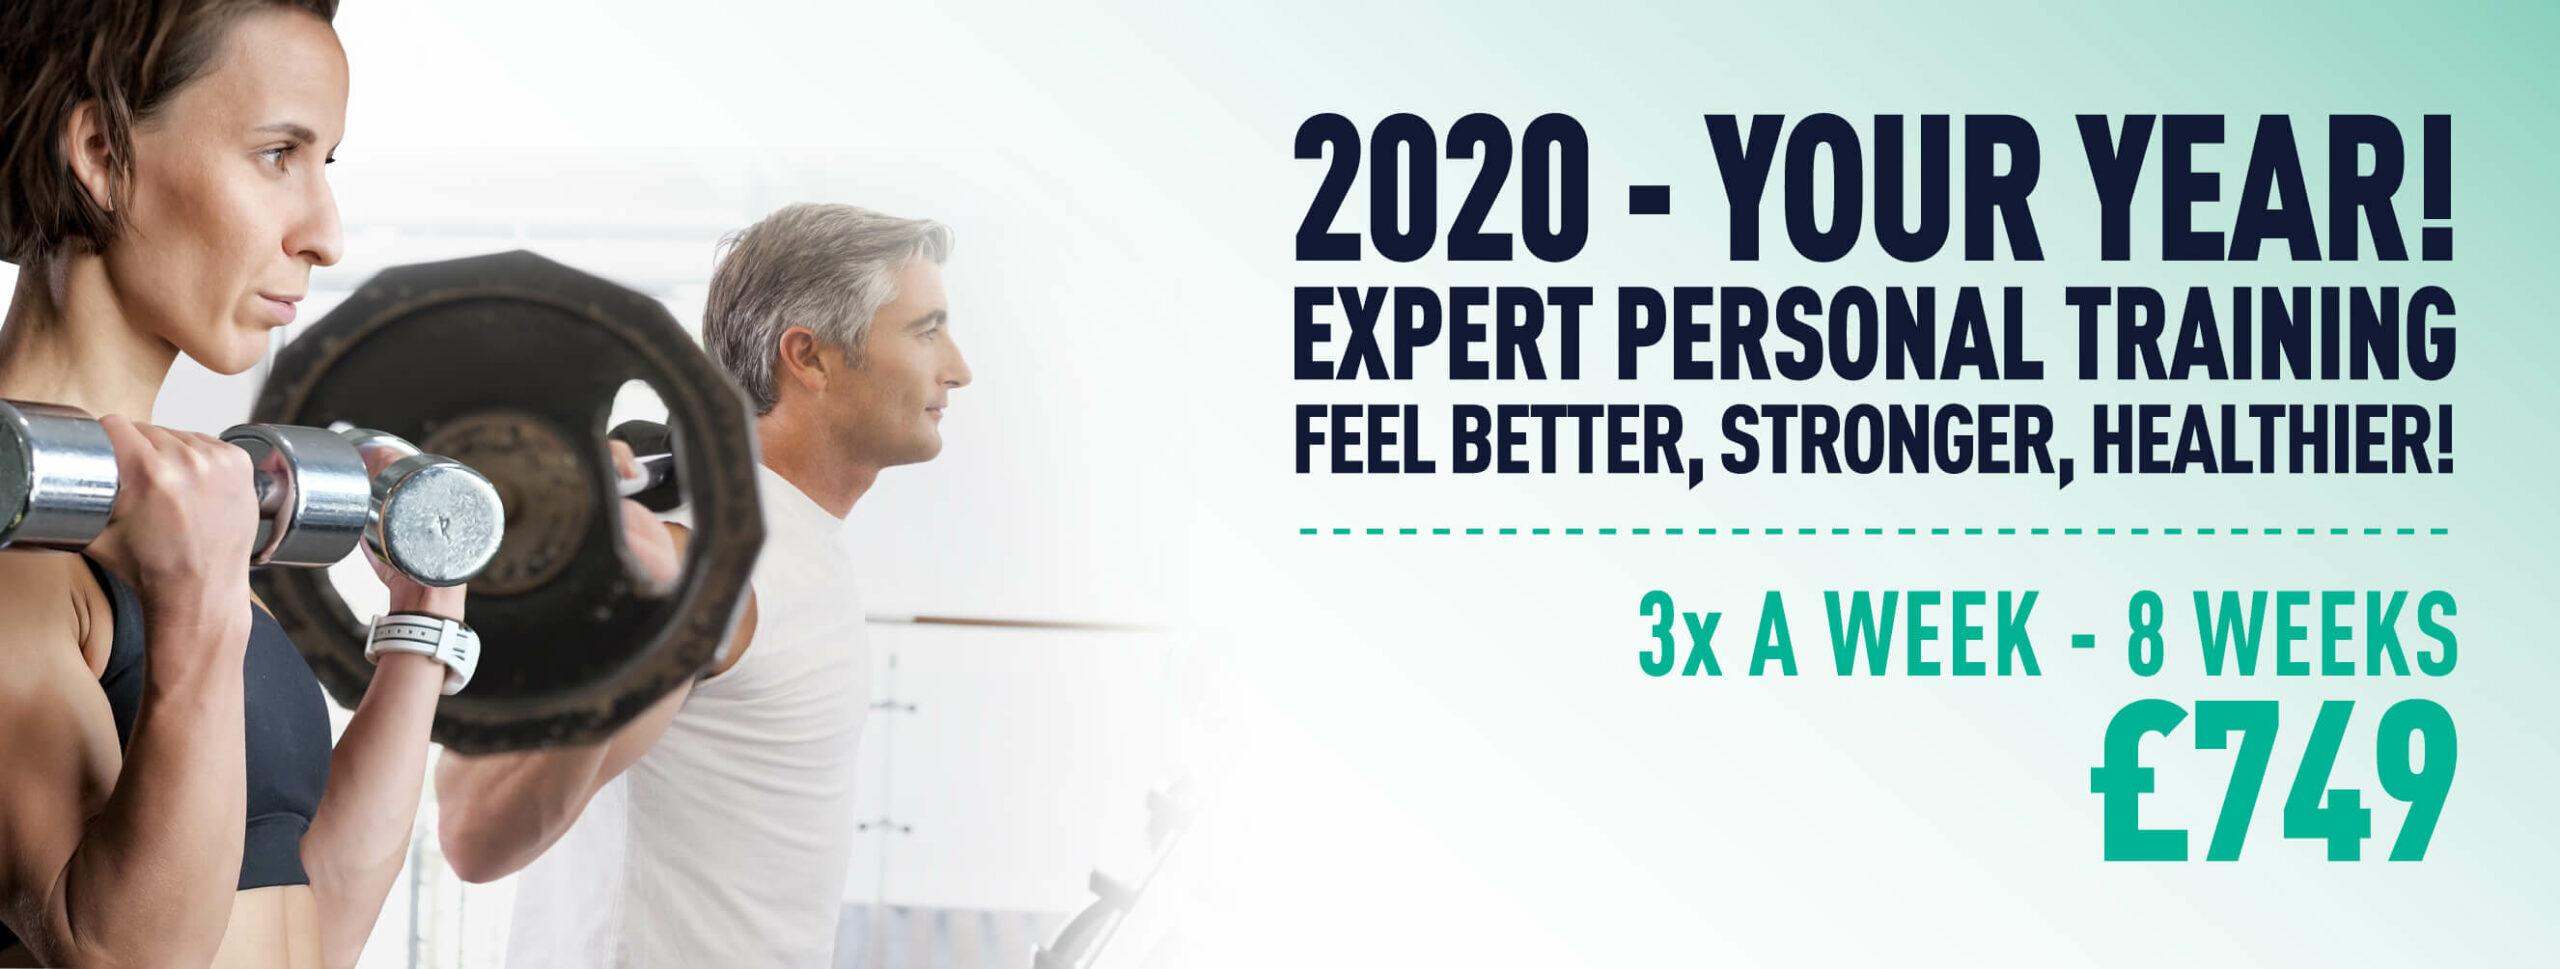 New Year Personal Training Deal - 2020 Kick Start